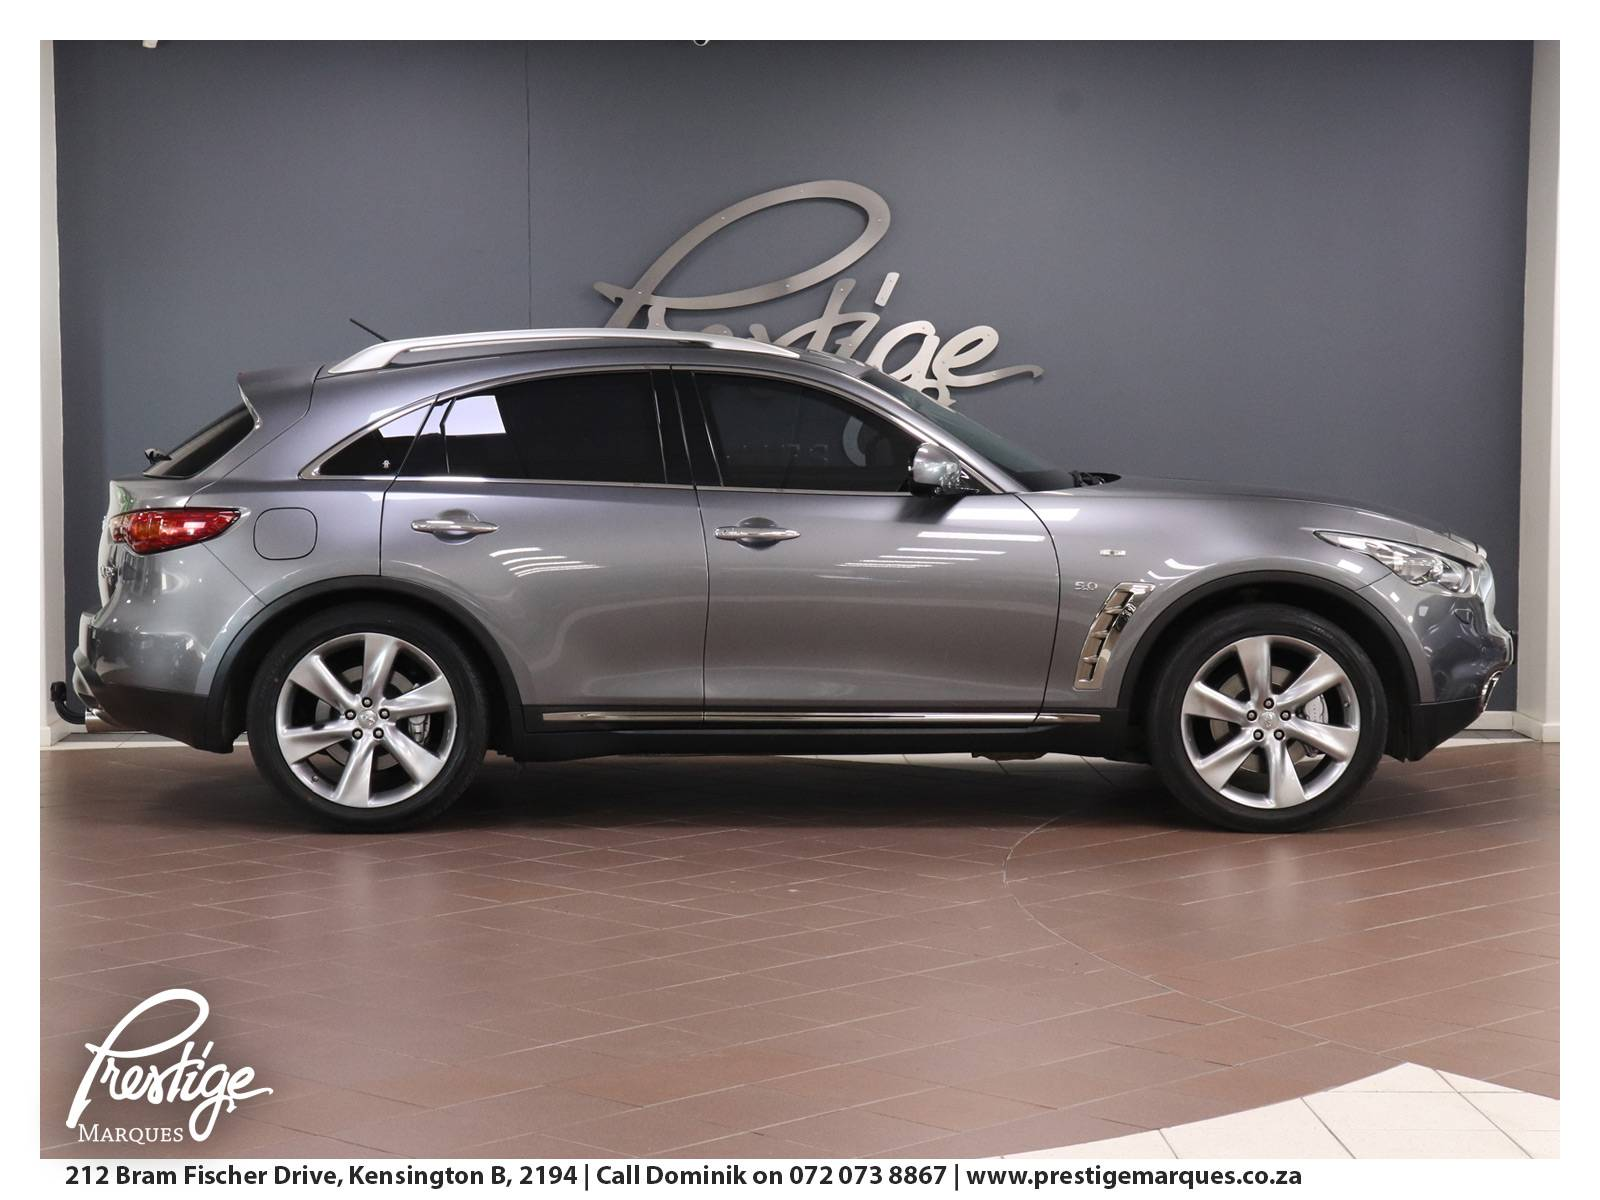 2014- infinity-Qx70 s- (5.L V8)- Prestige-Marques-Randburg-Sandton-3